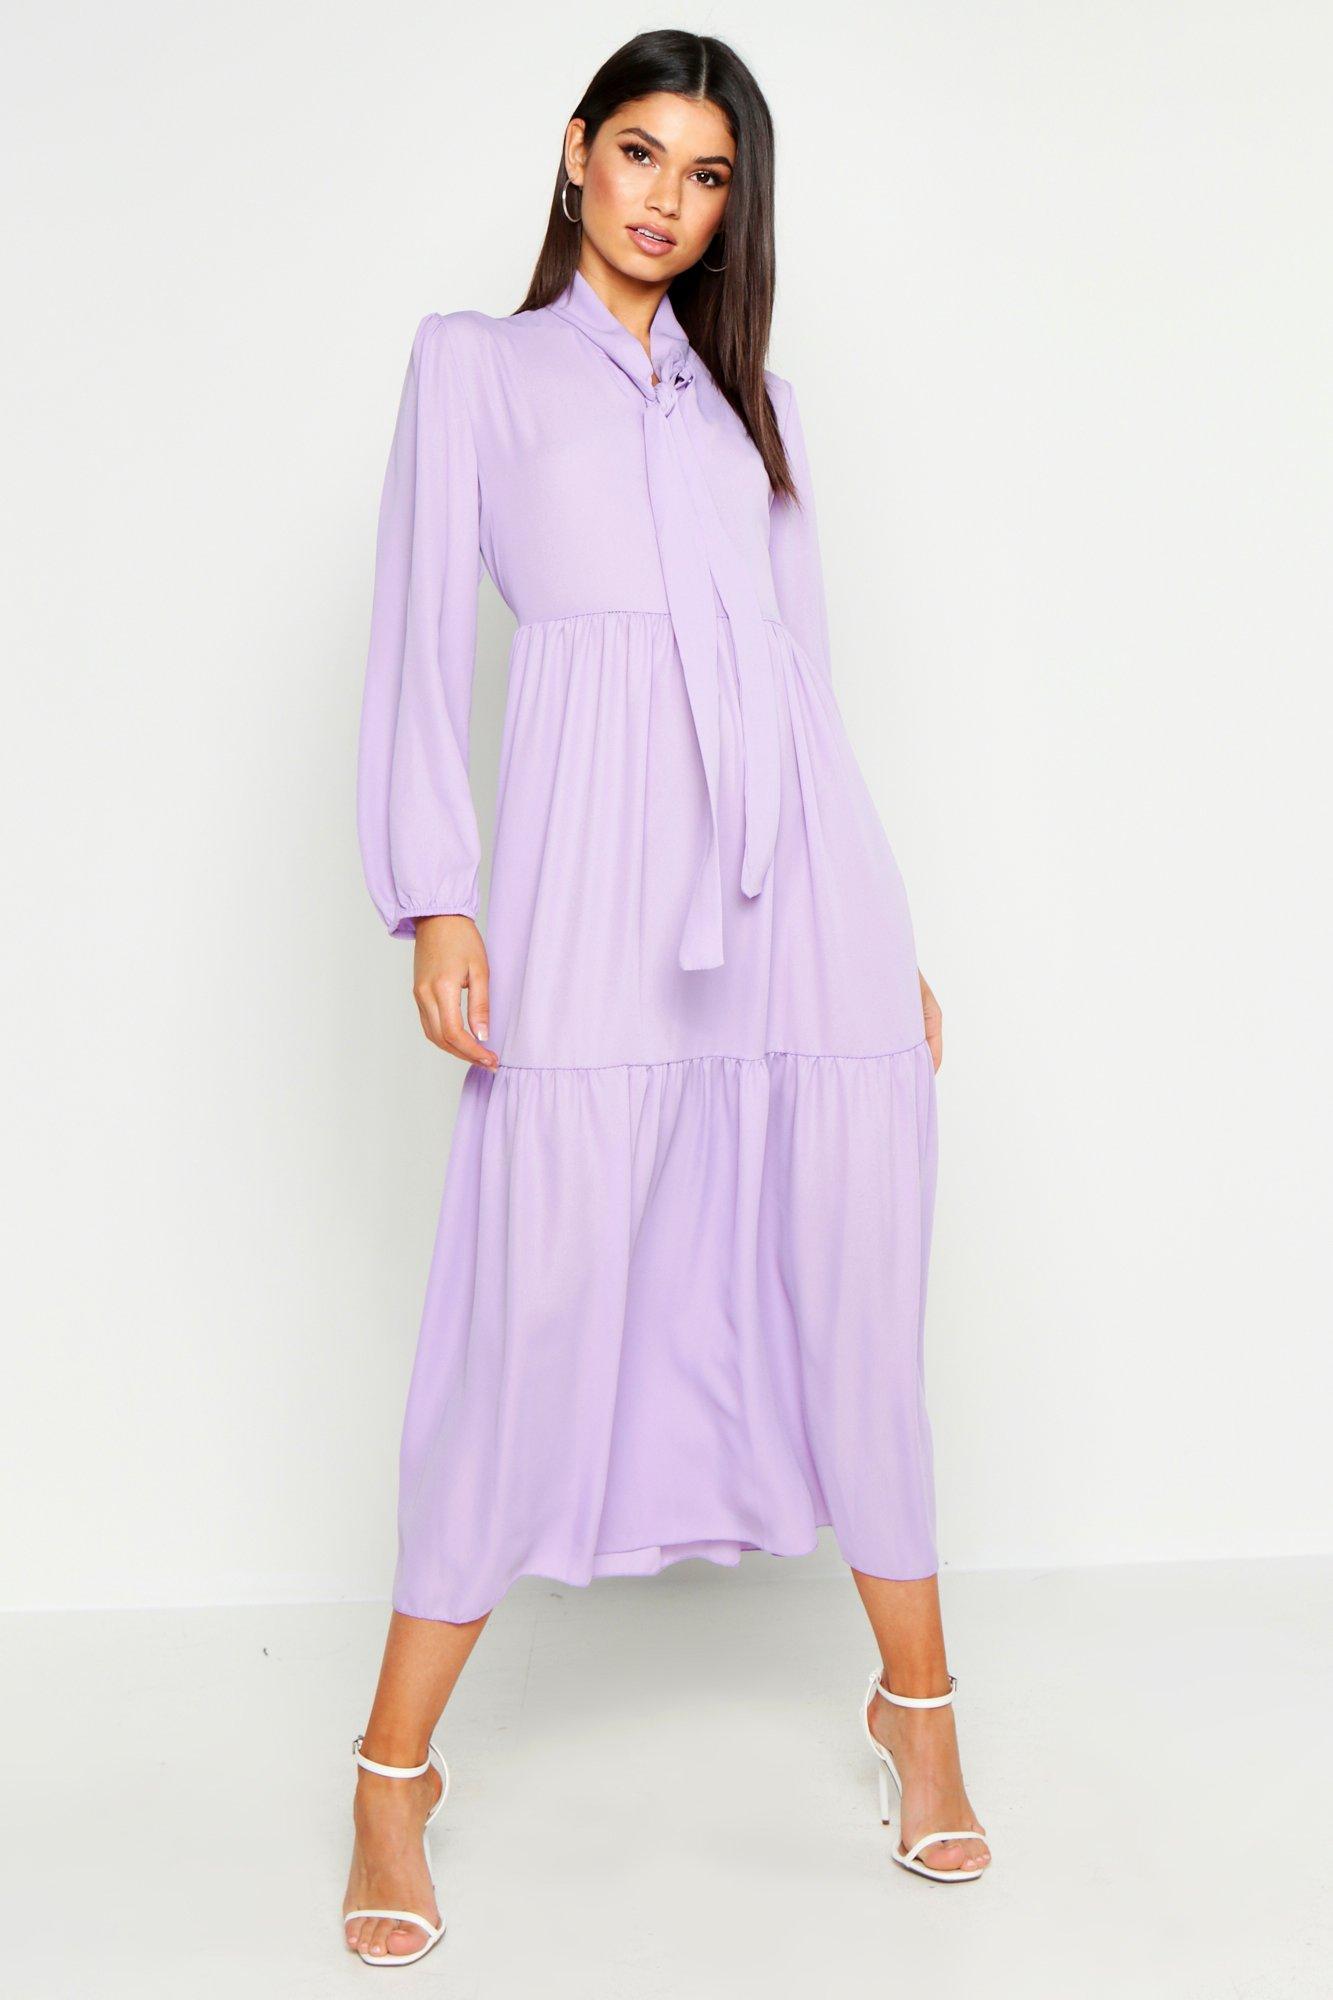 70s Dresses – Disco Dress, Hippie Dress, Wrap Dress Oversized Smock Dress $44.00 AT vintagedancer.com